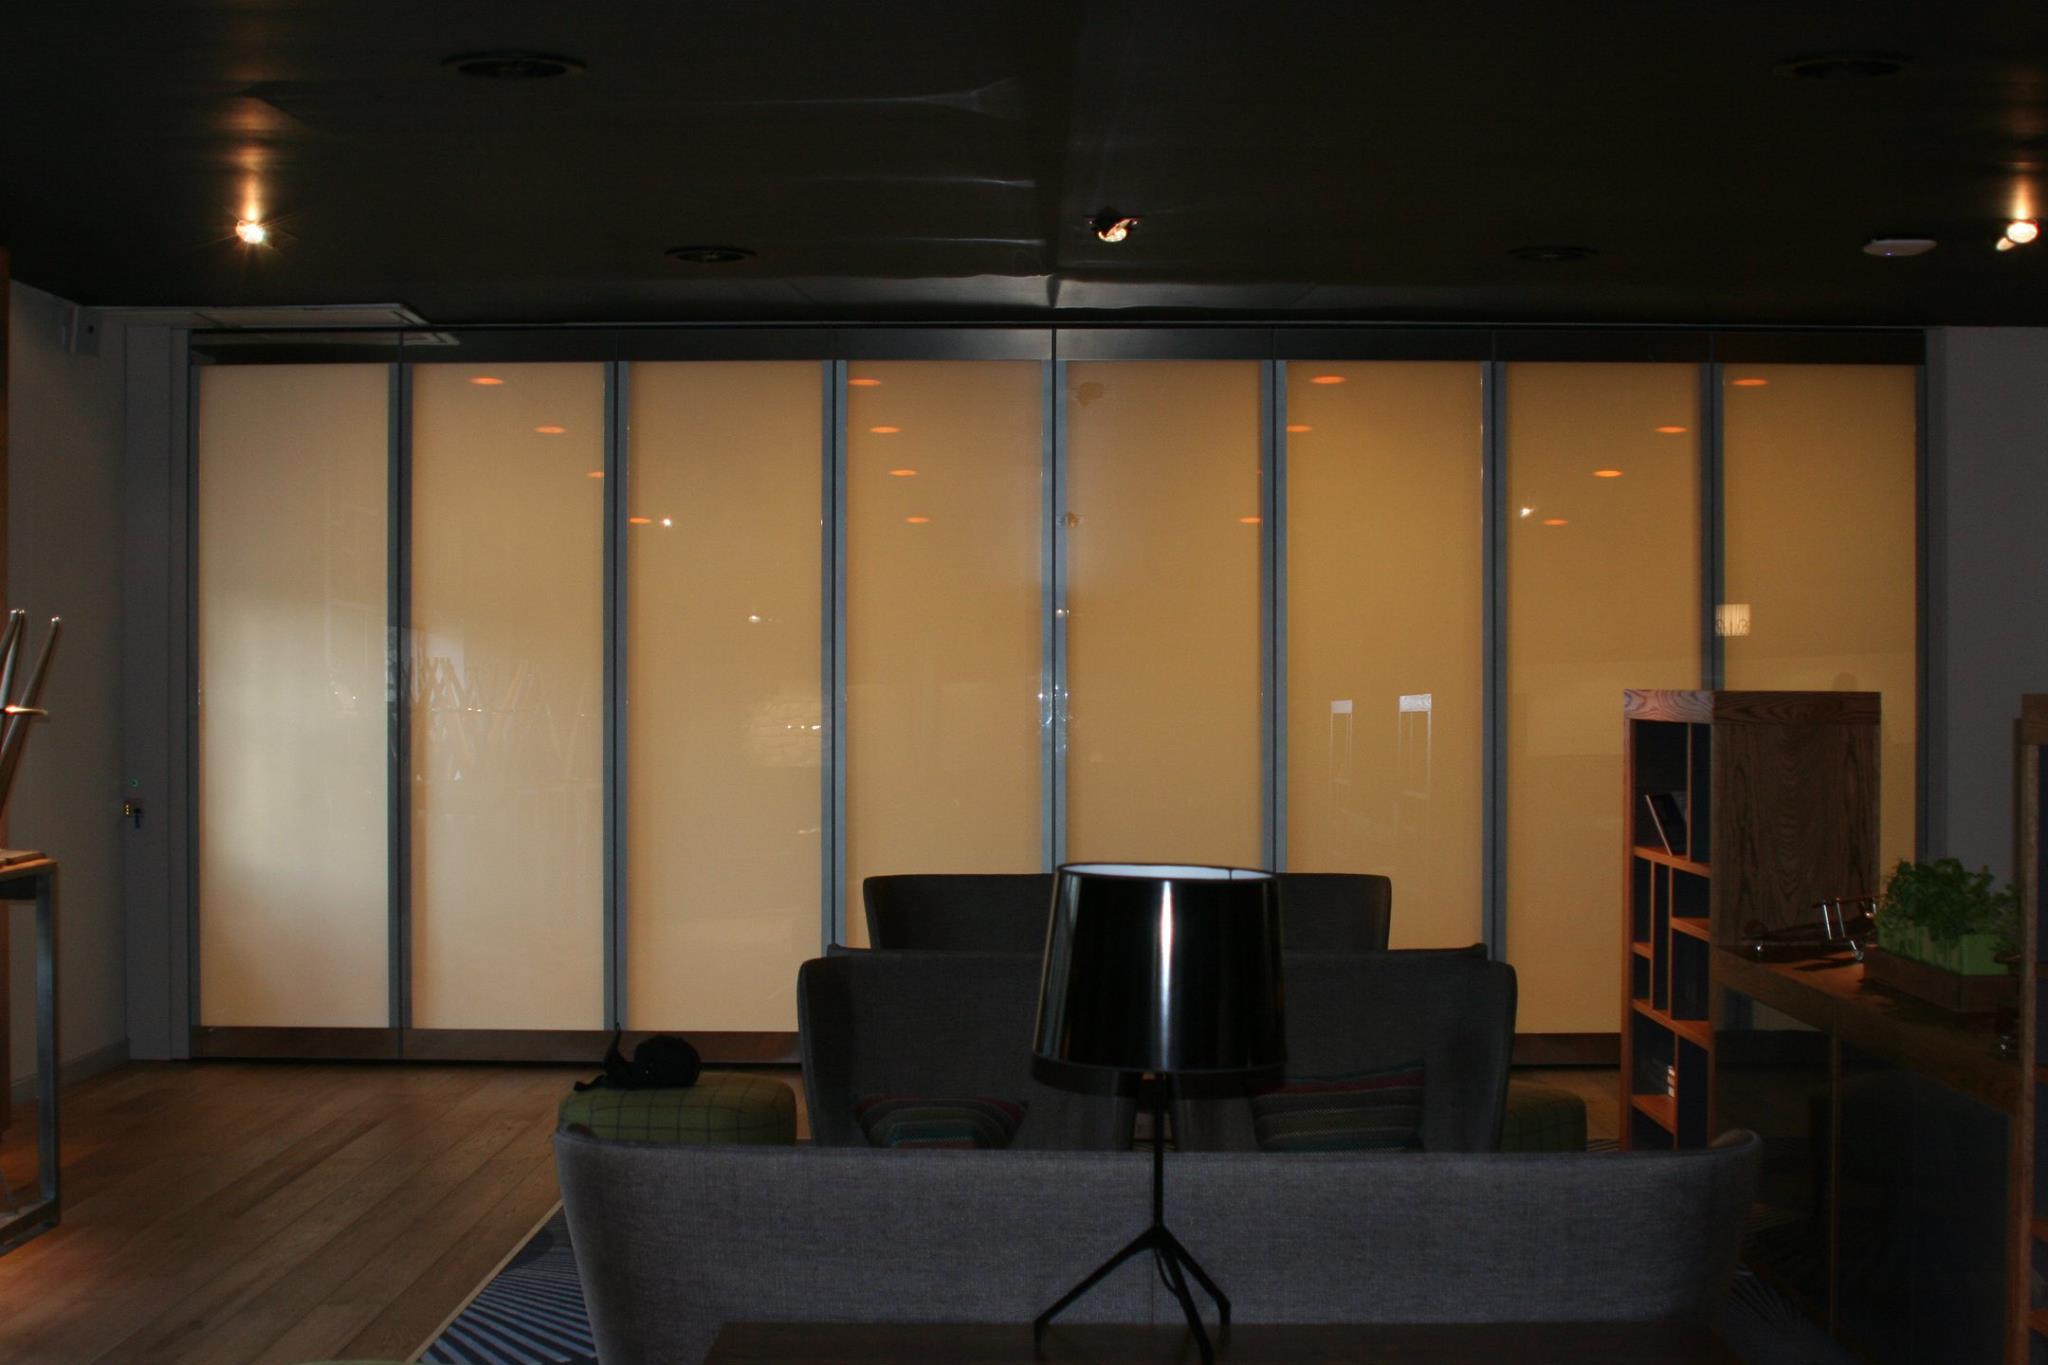 ELECTRIC PRIVACY I-GLASS BI-FOLDING DOORS PRIVATE.jpg